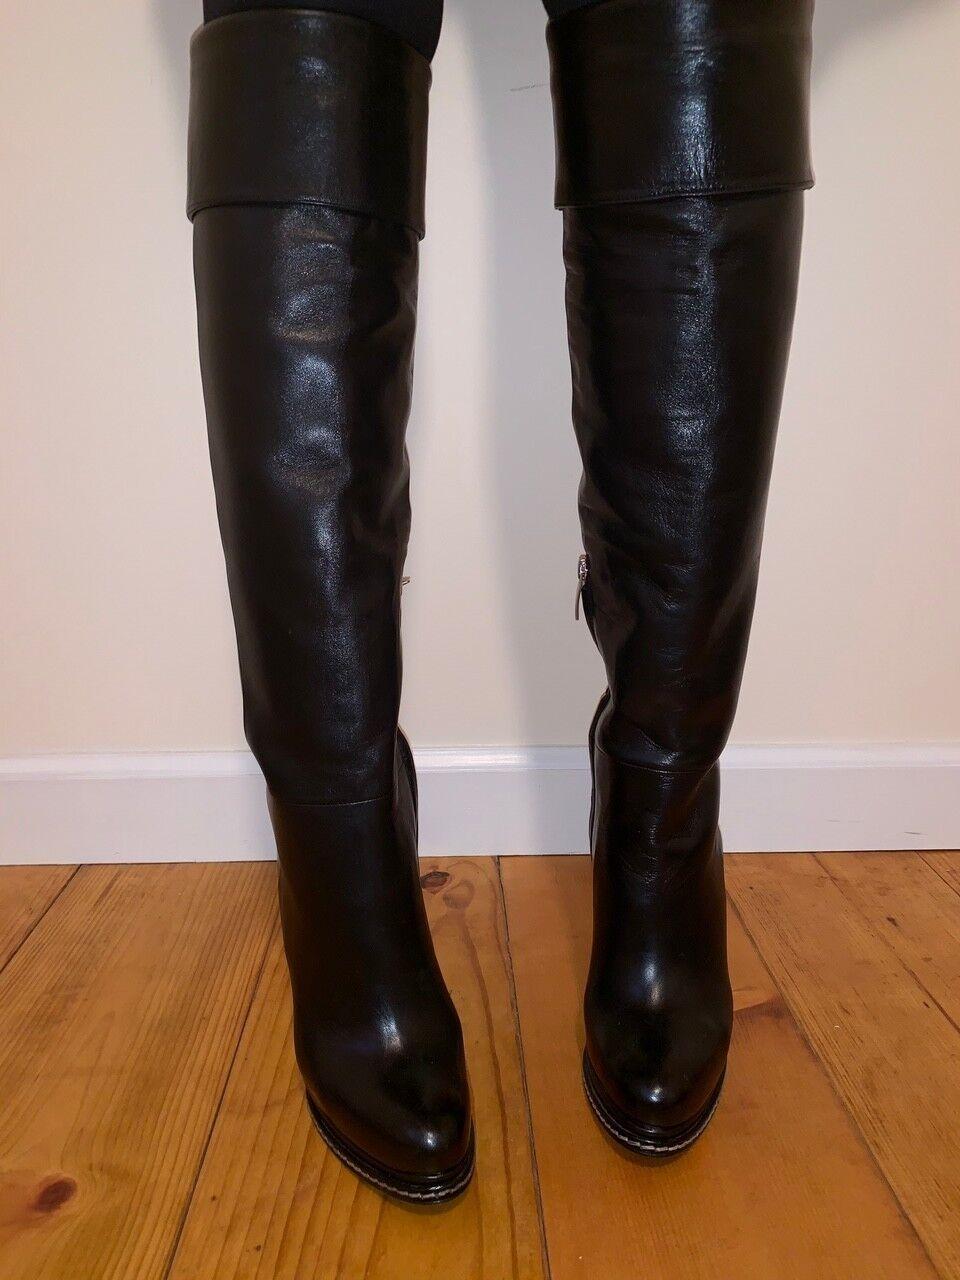 moda Donna  Barbara Bui nero Knee High High High Heeled stivali Dimensione 7.5  vendite online